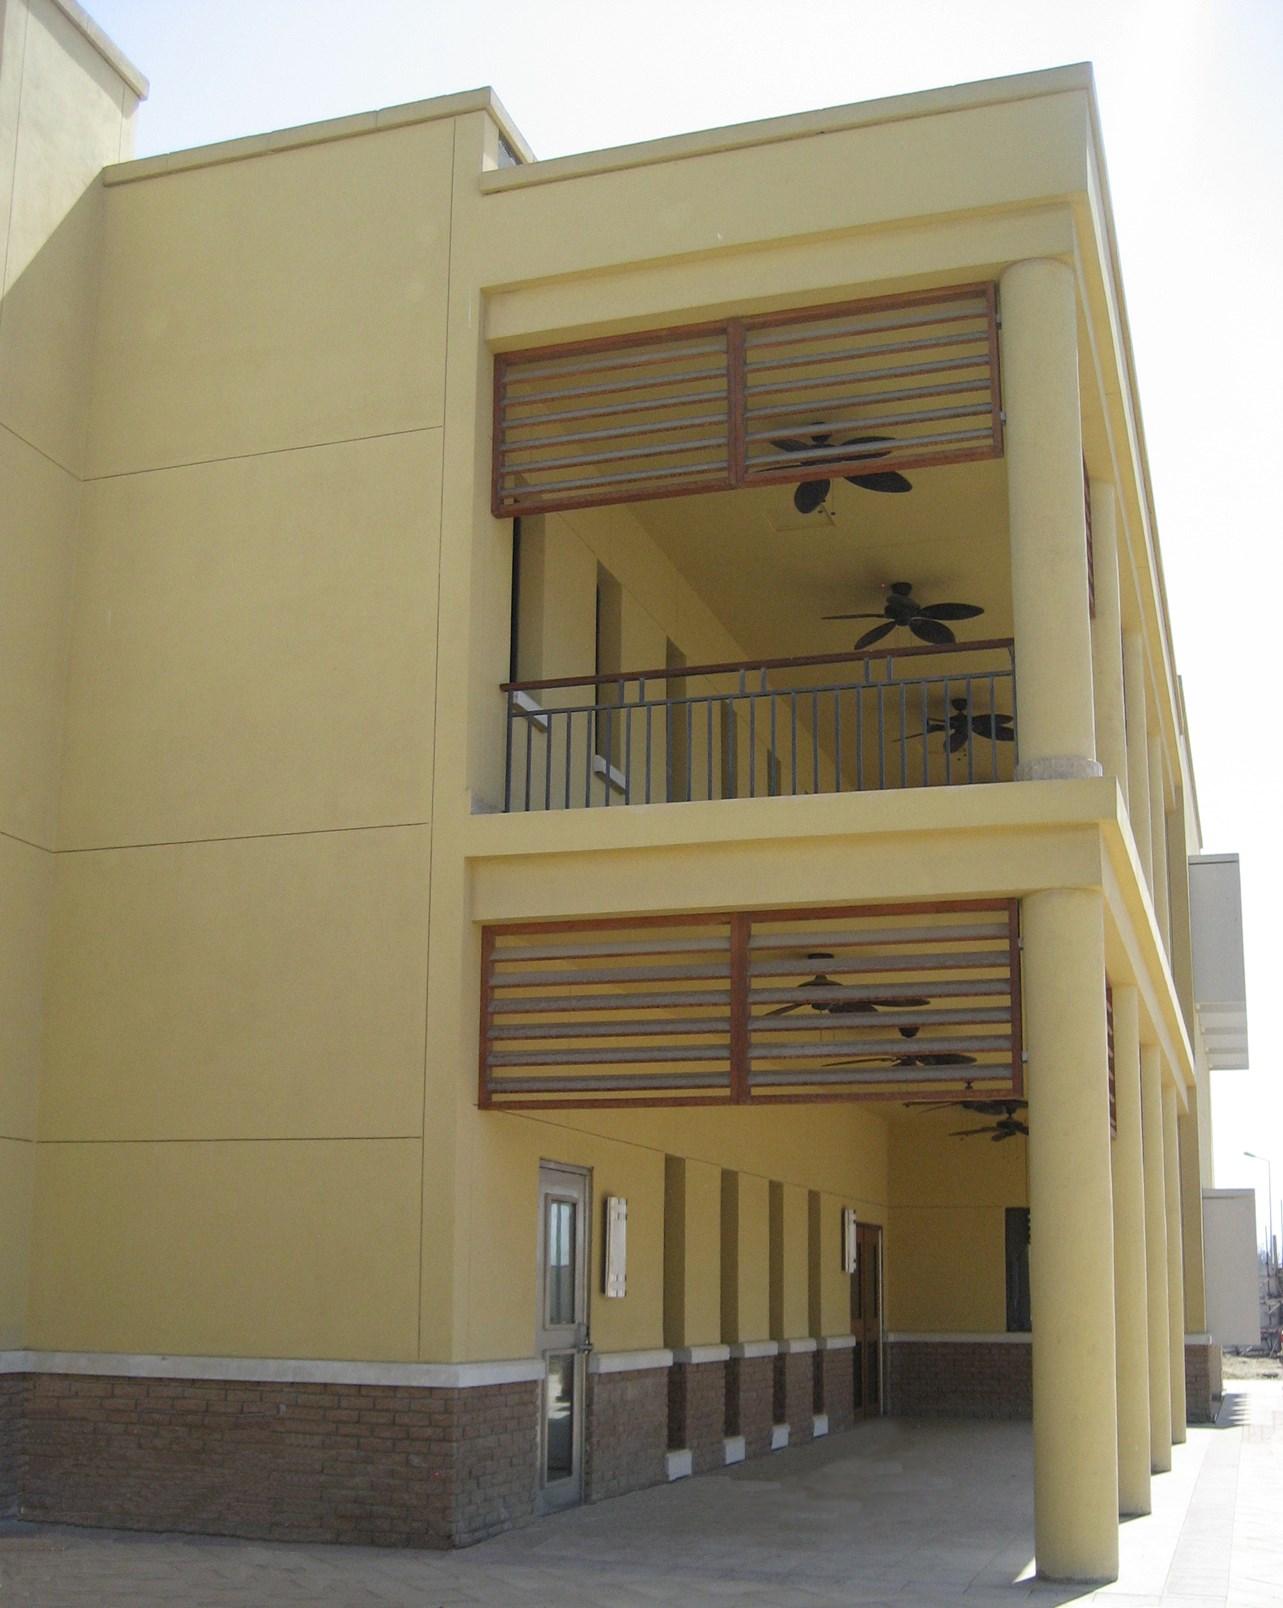 U S  Consulate Housing | KCCT Architecture